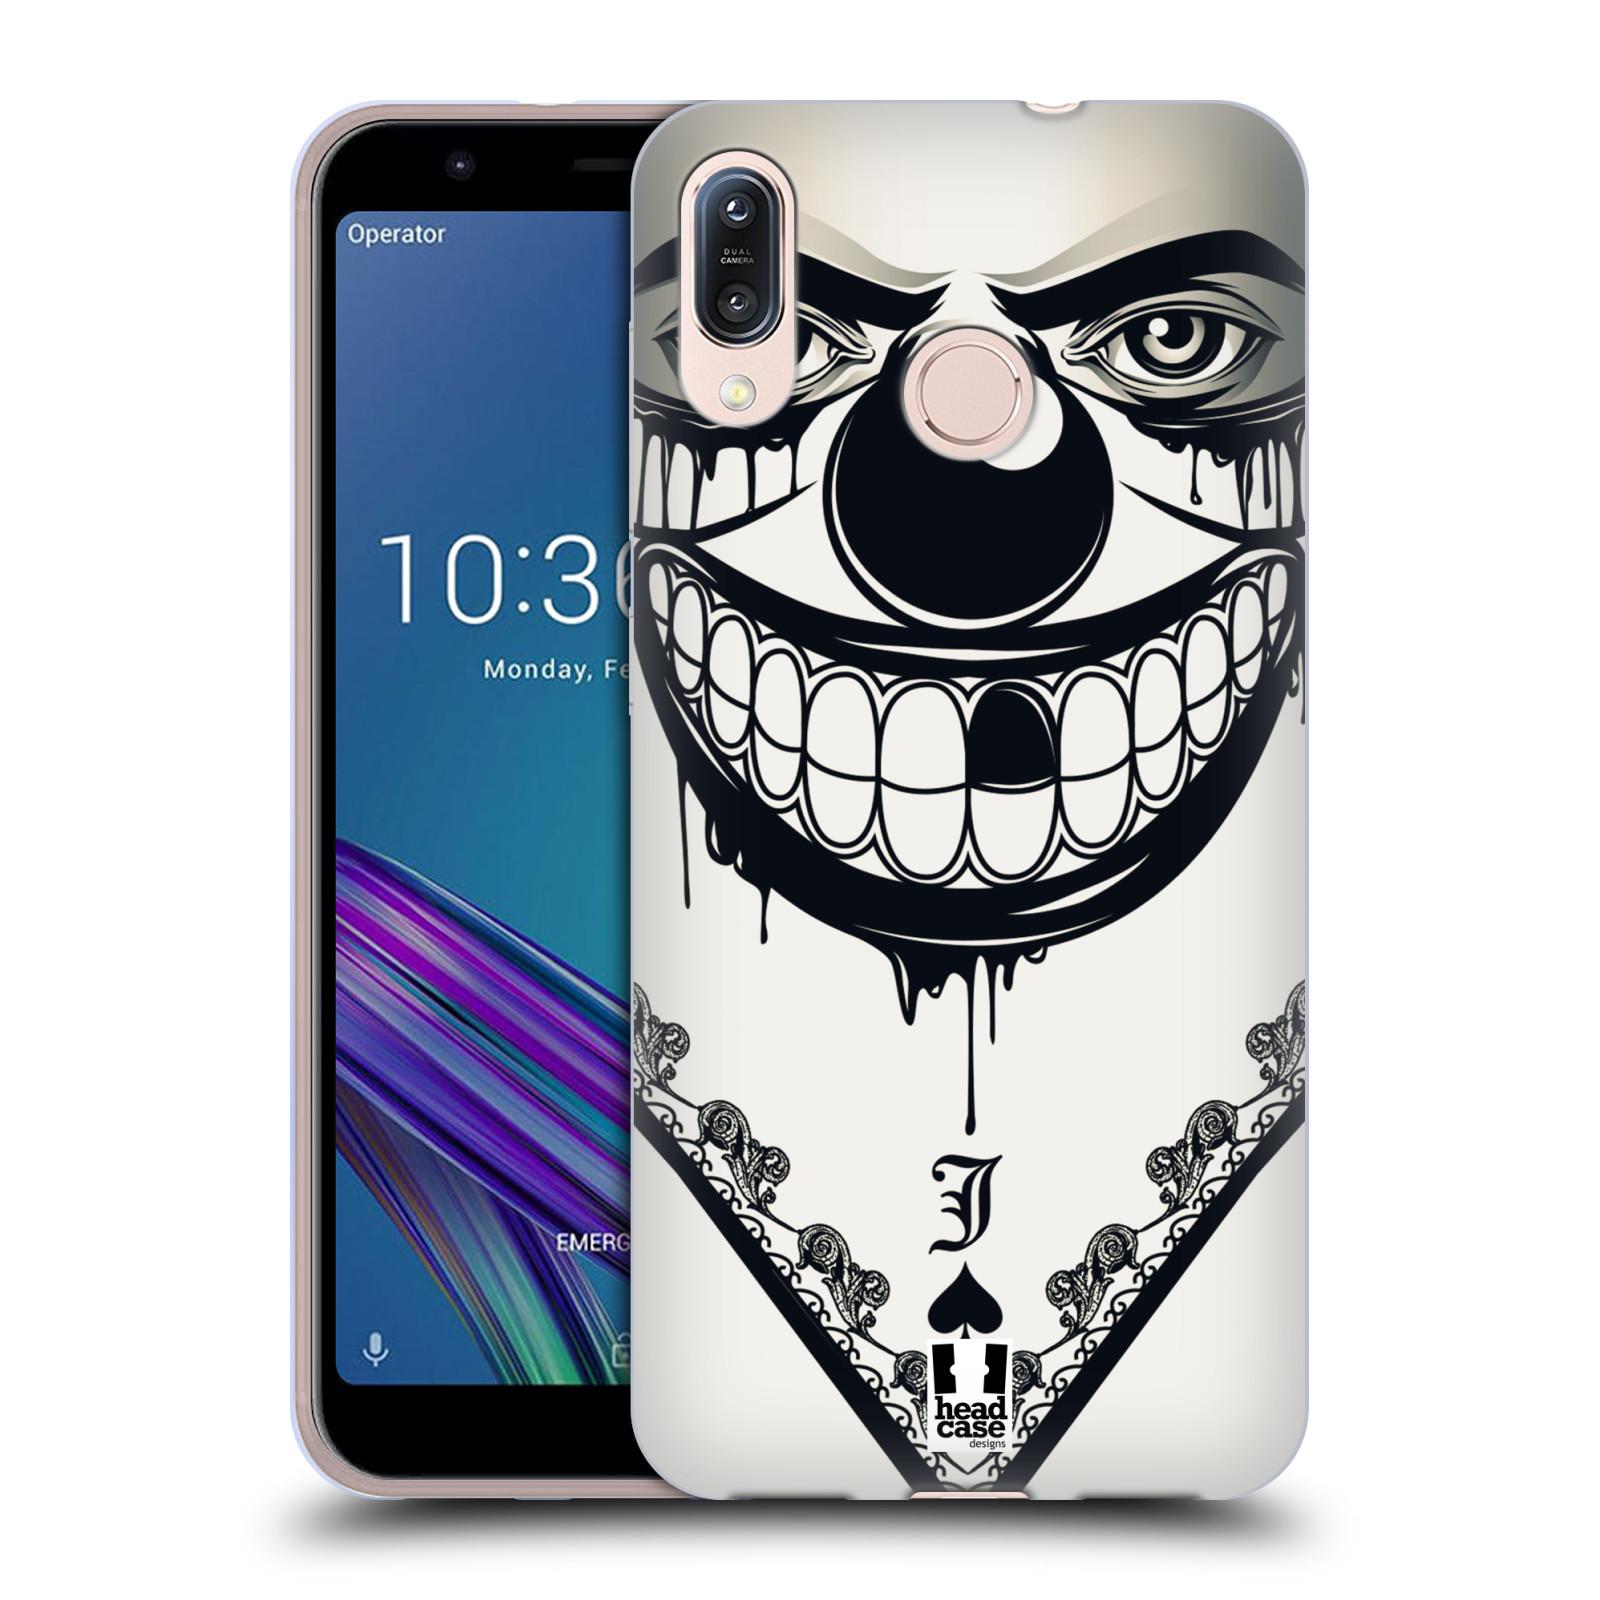 Silikonové pouzdro na mobil Asus Zenfone Max M1 ZB555KL - Head Case - ZLEJ KLAUN